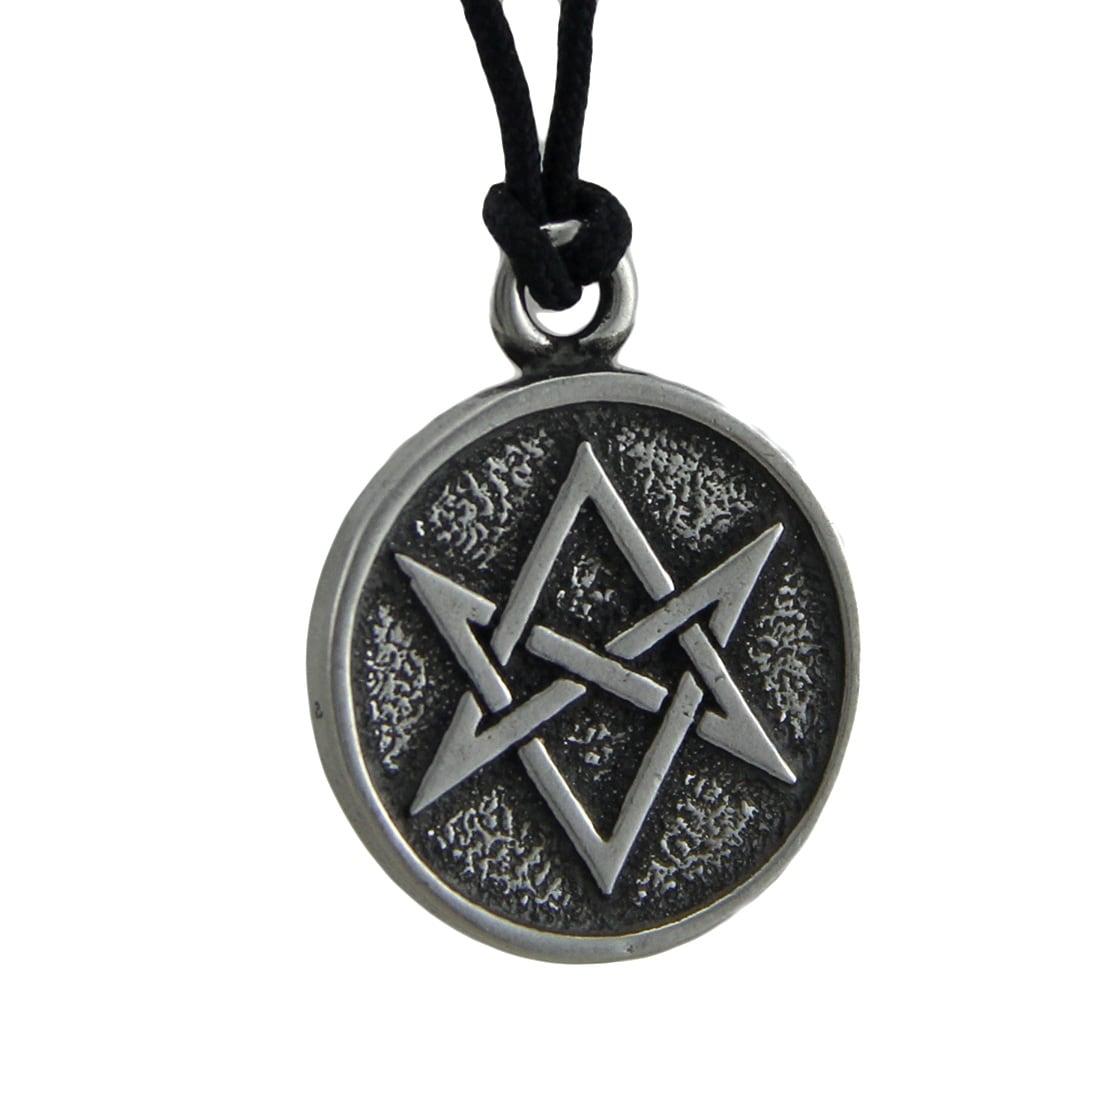 Magic Hexagram Charm Amulets of World pendant talisman